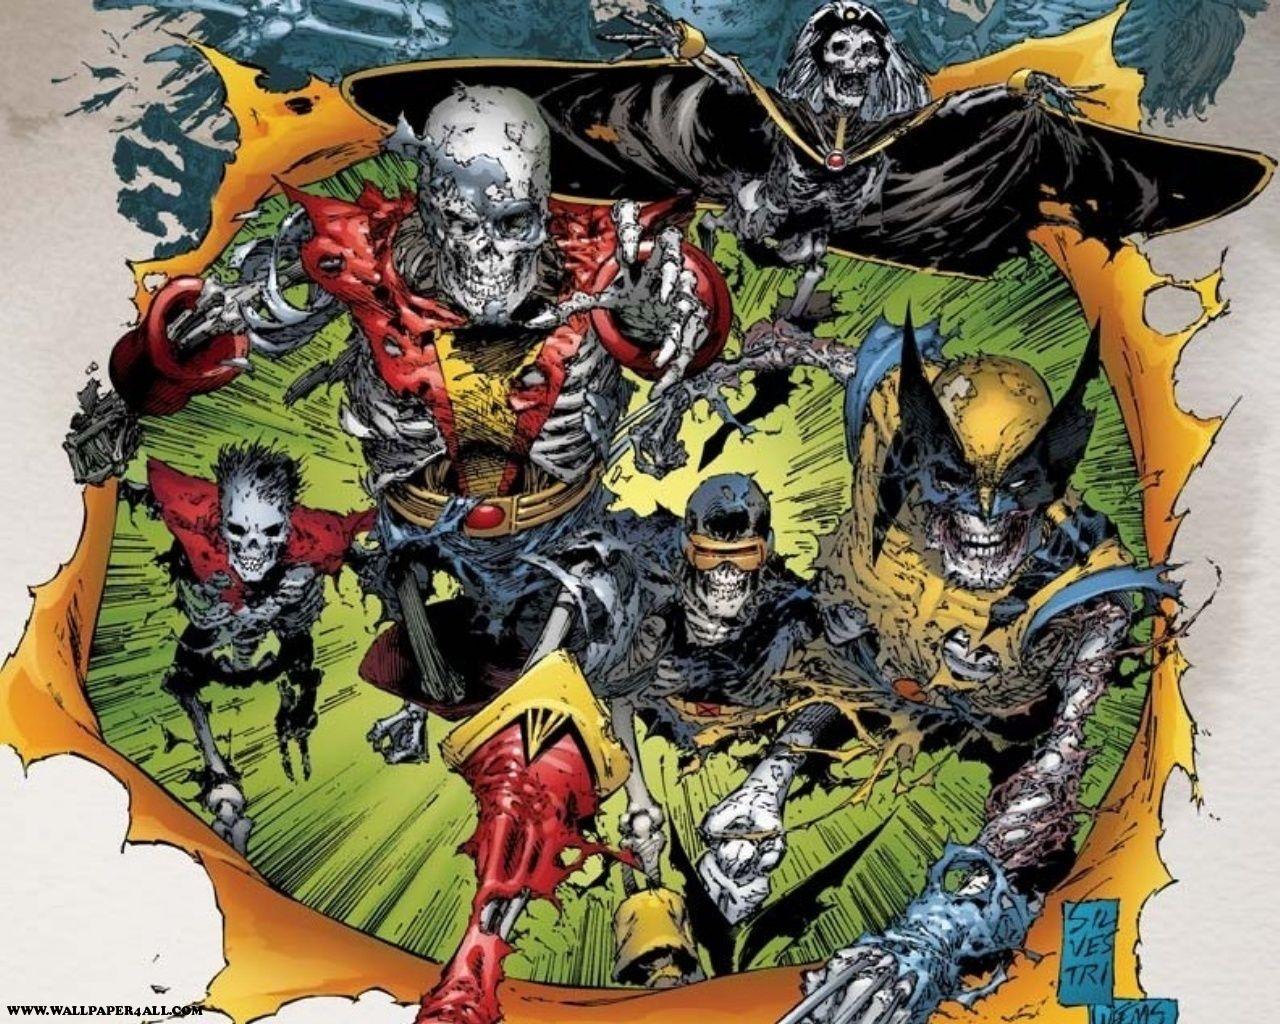 Good Wallpaper Marvel Halloween - 9e5fc478370b4a755ef5ac8c8647daab  Picture_479285.jpg